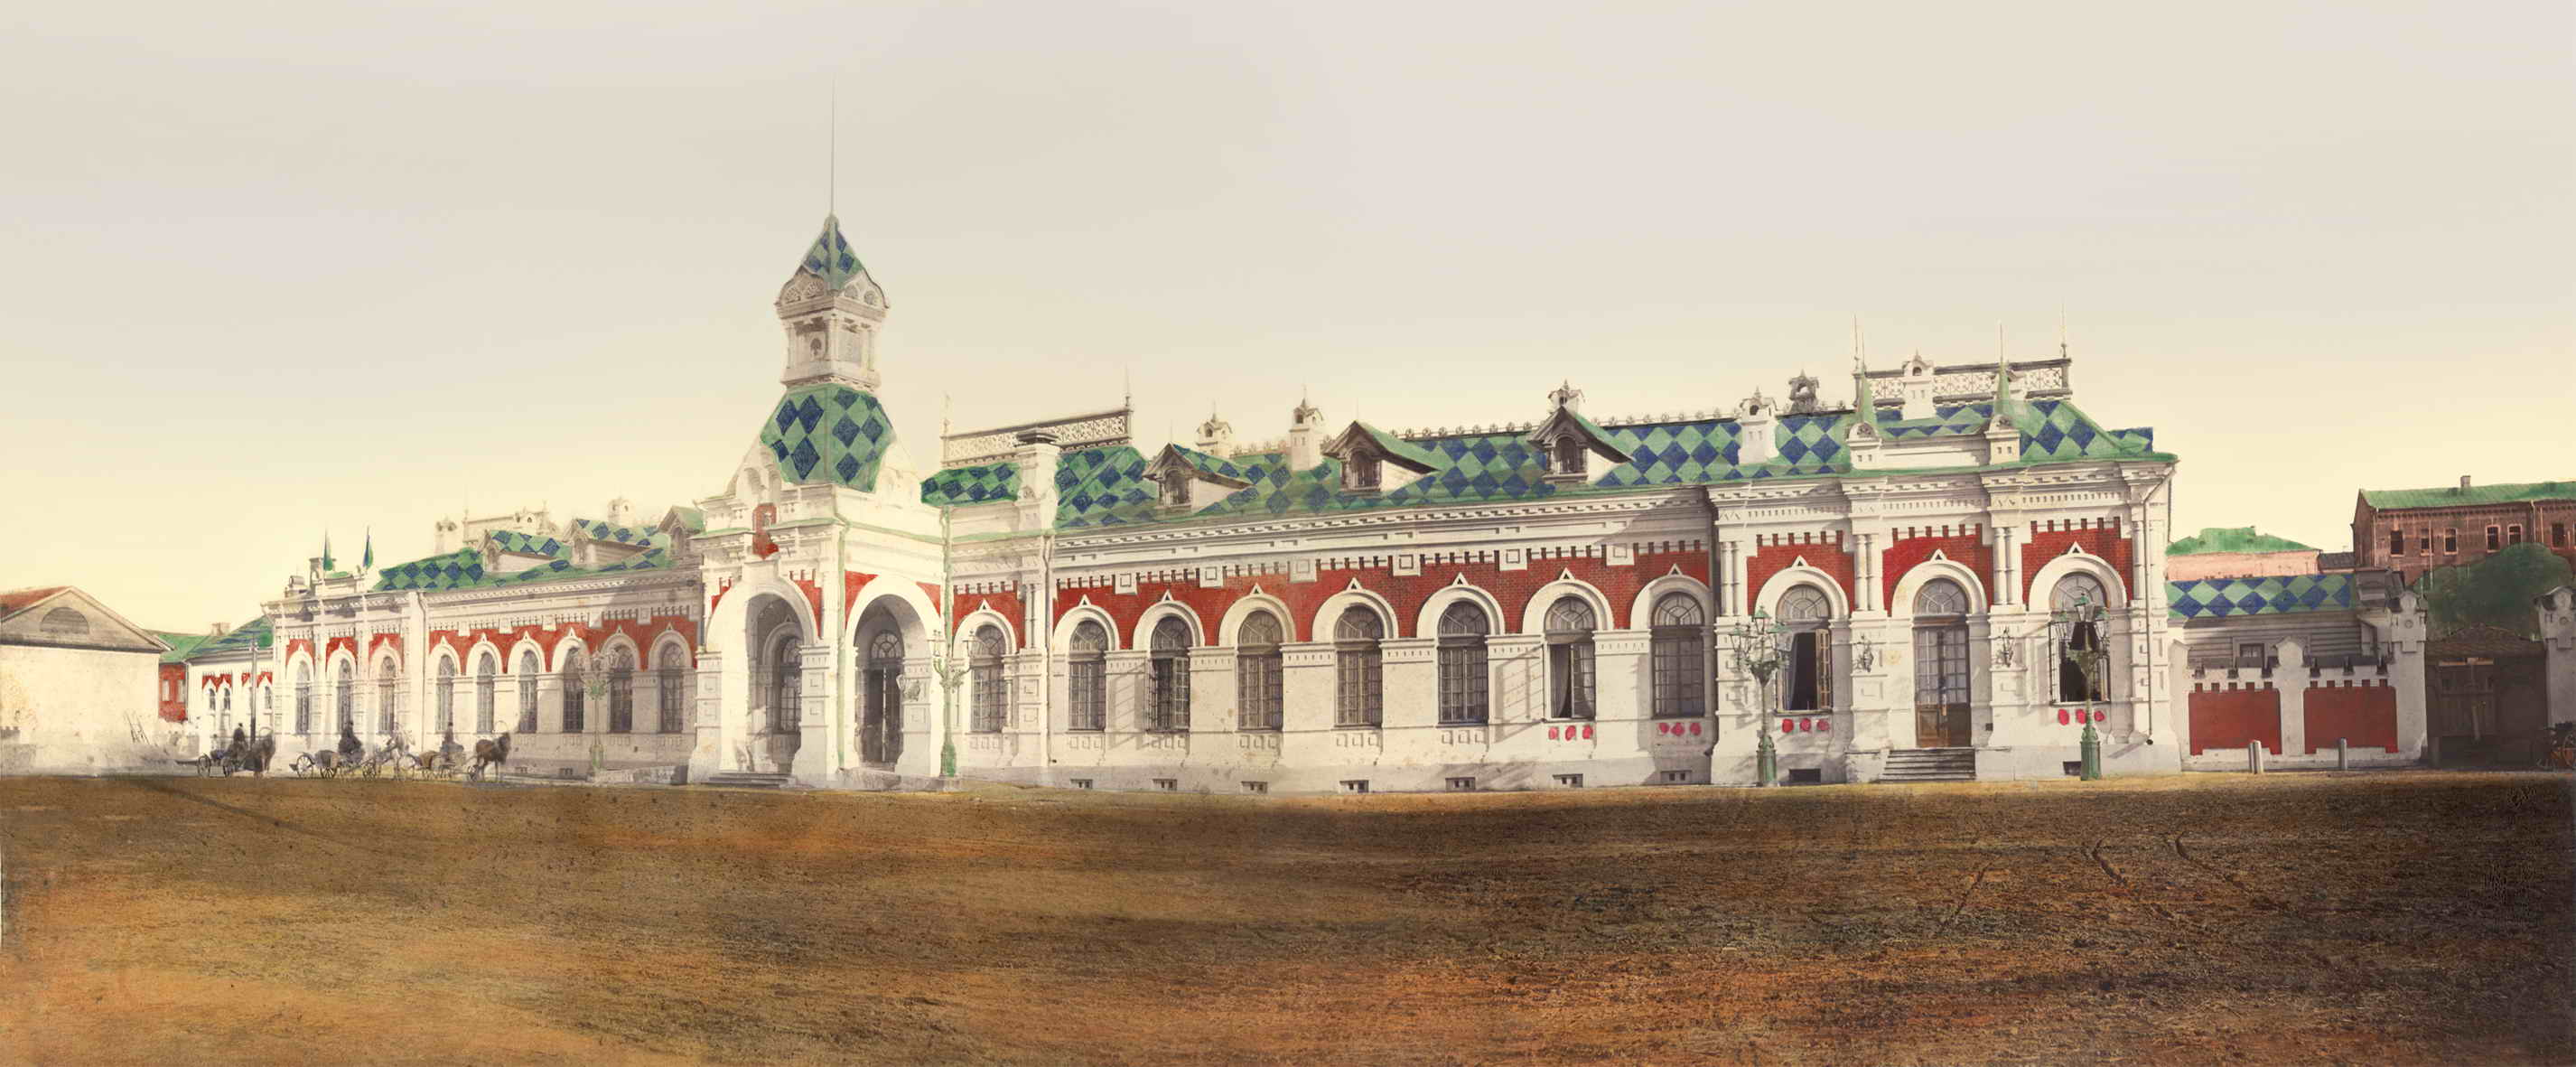 002_Станция Пермь